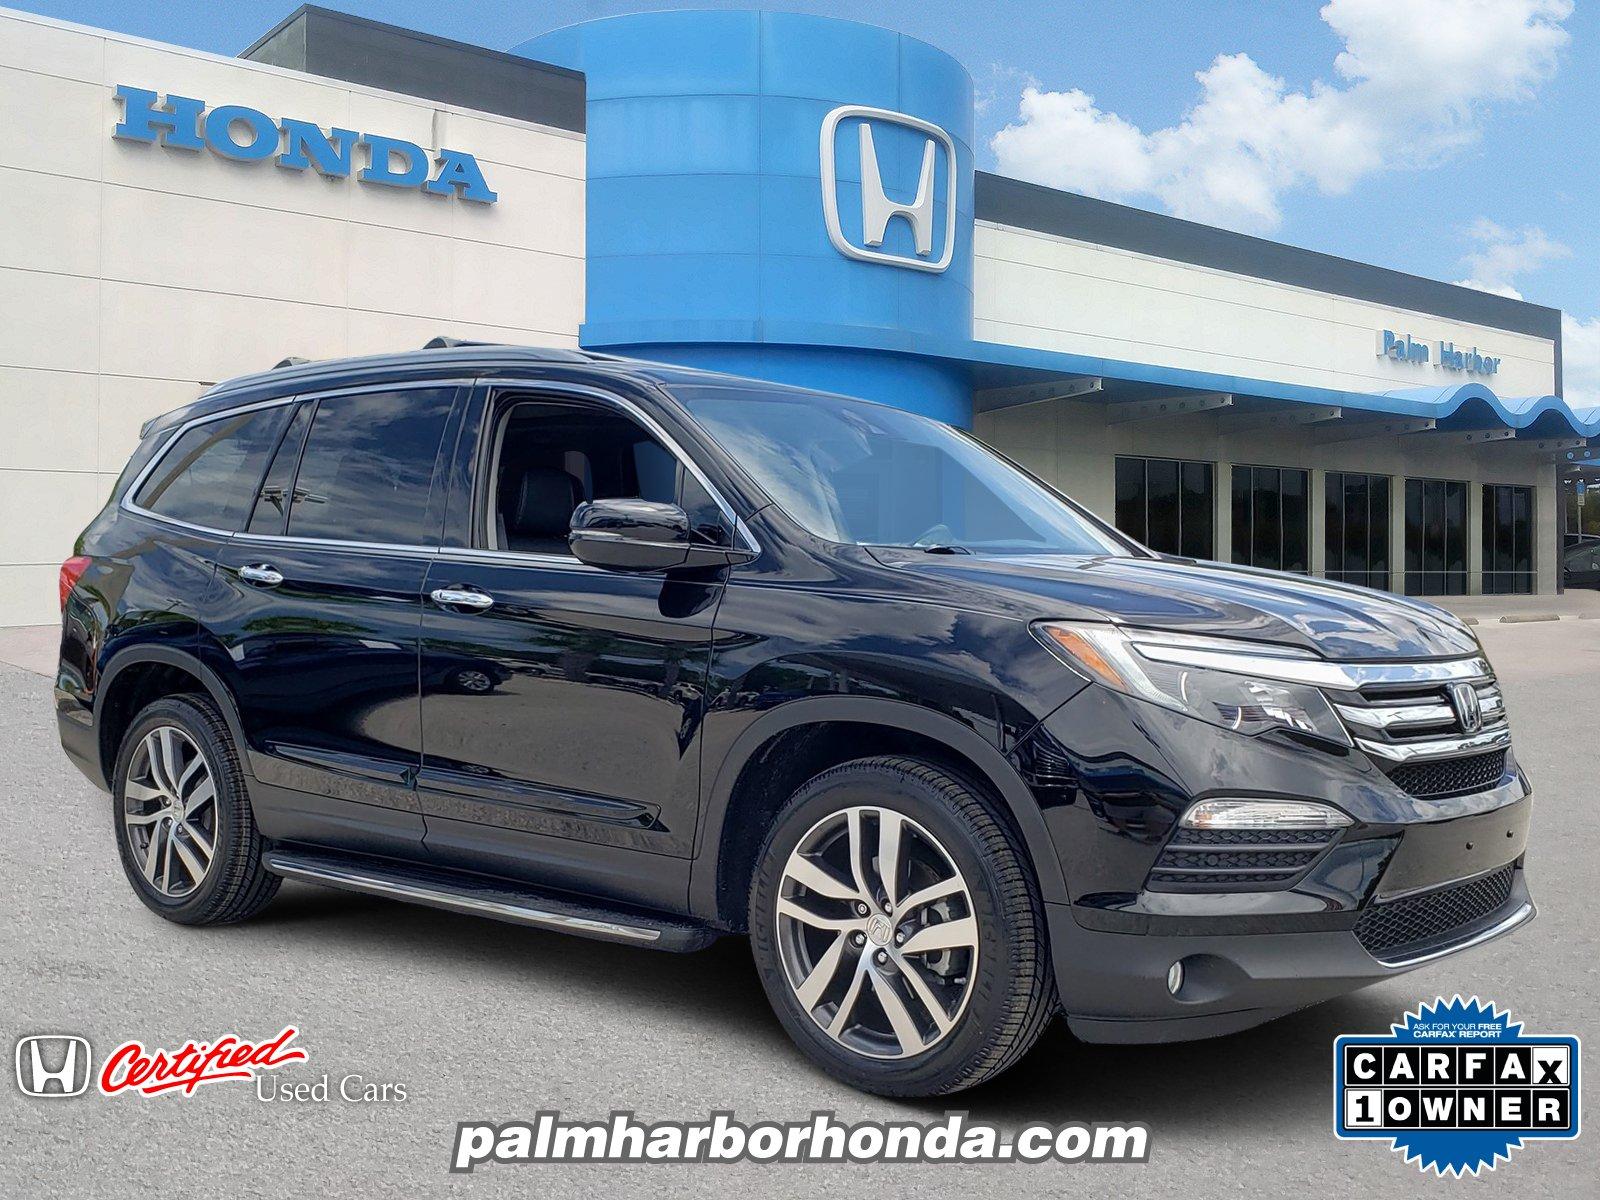 Certified Pre Owned Honda >> Certified Pre Owned Honda Discounts Cpo Honda Deals Tampa